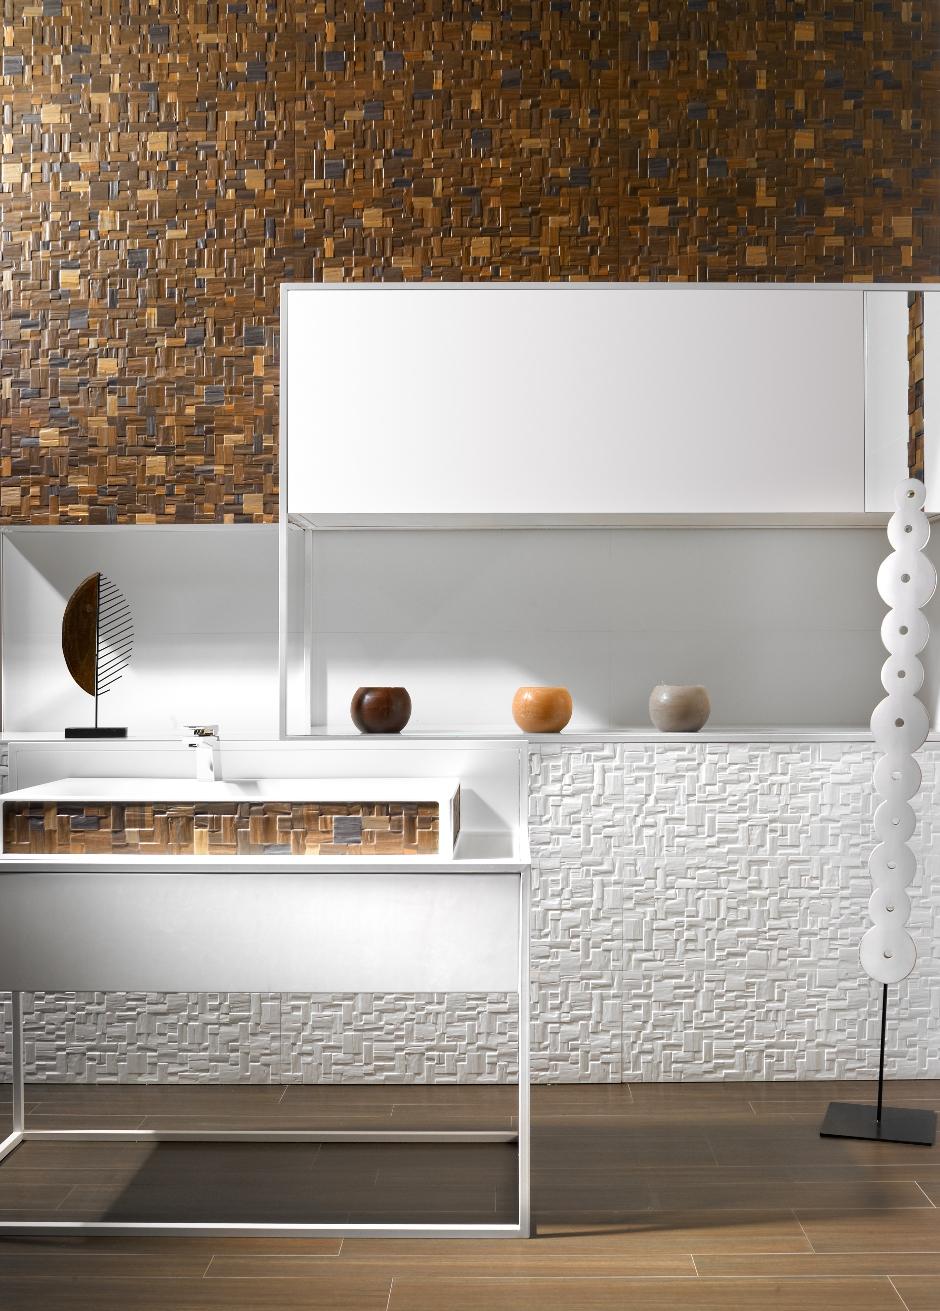 Render infografia de lavabo en resina acrilica window diseñado por discoh design para delicer ceramica